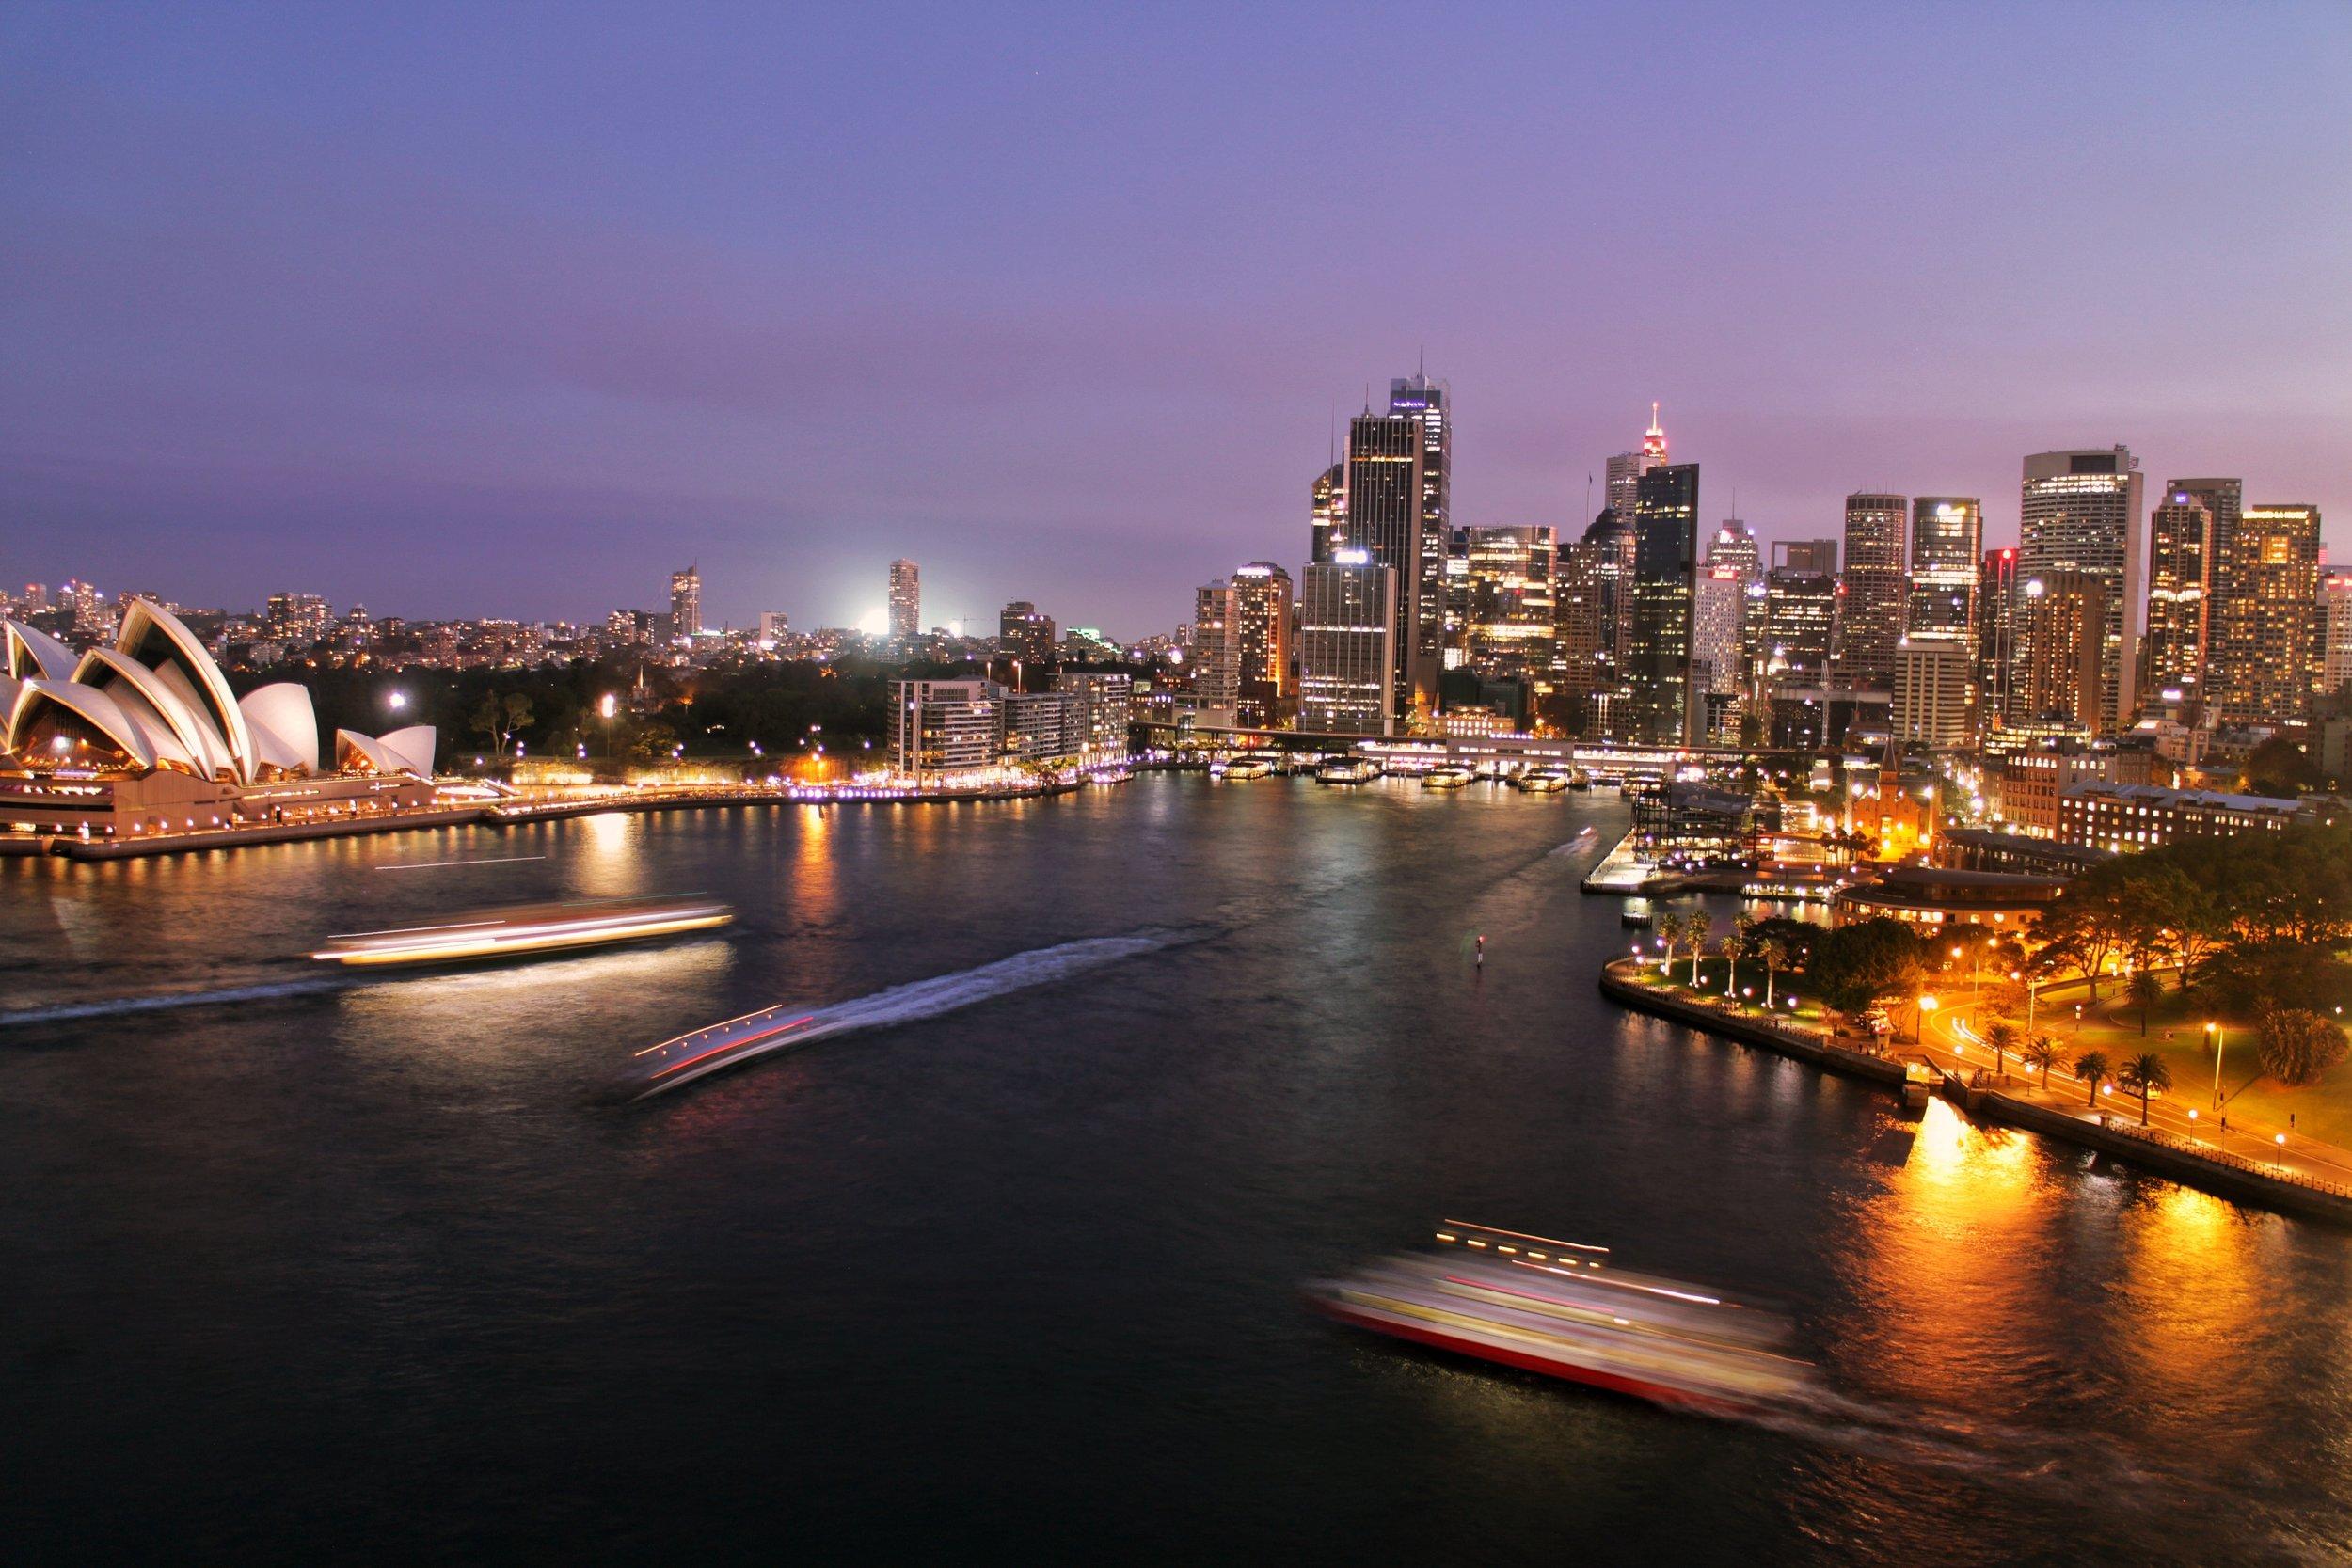 architecture-australia-buildings-995764.jpg